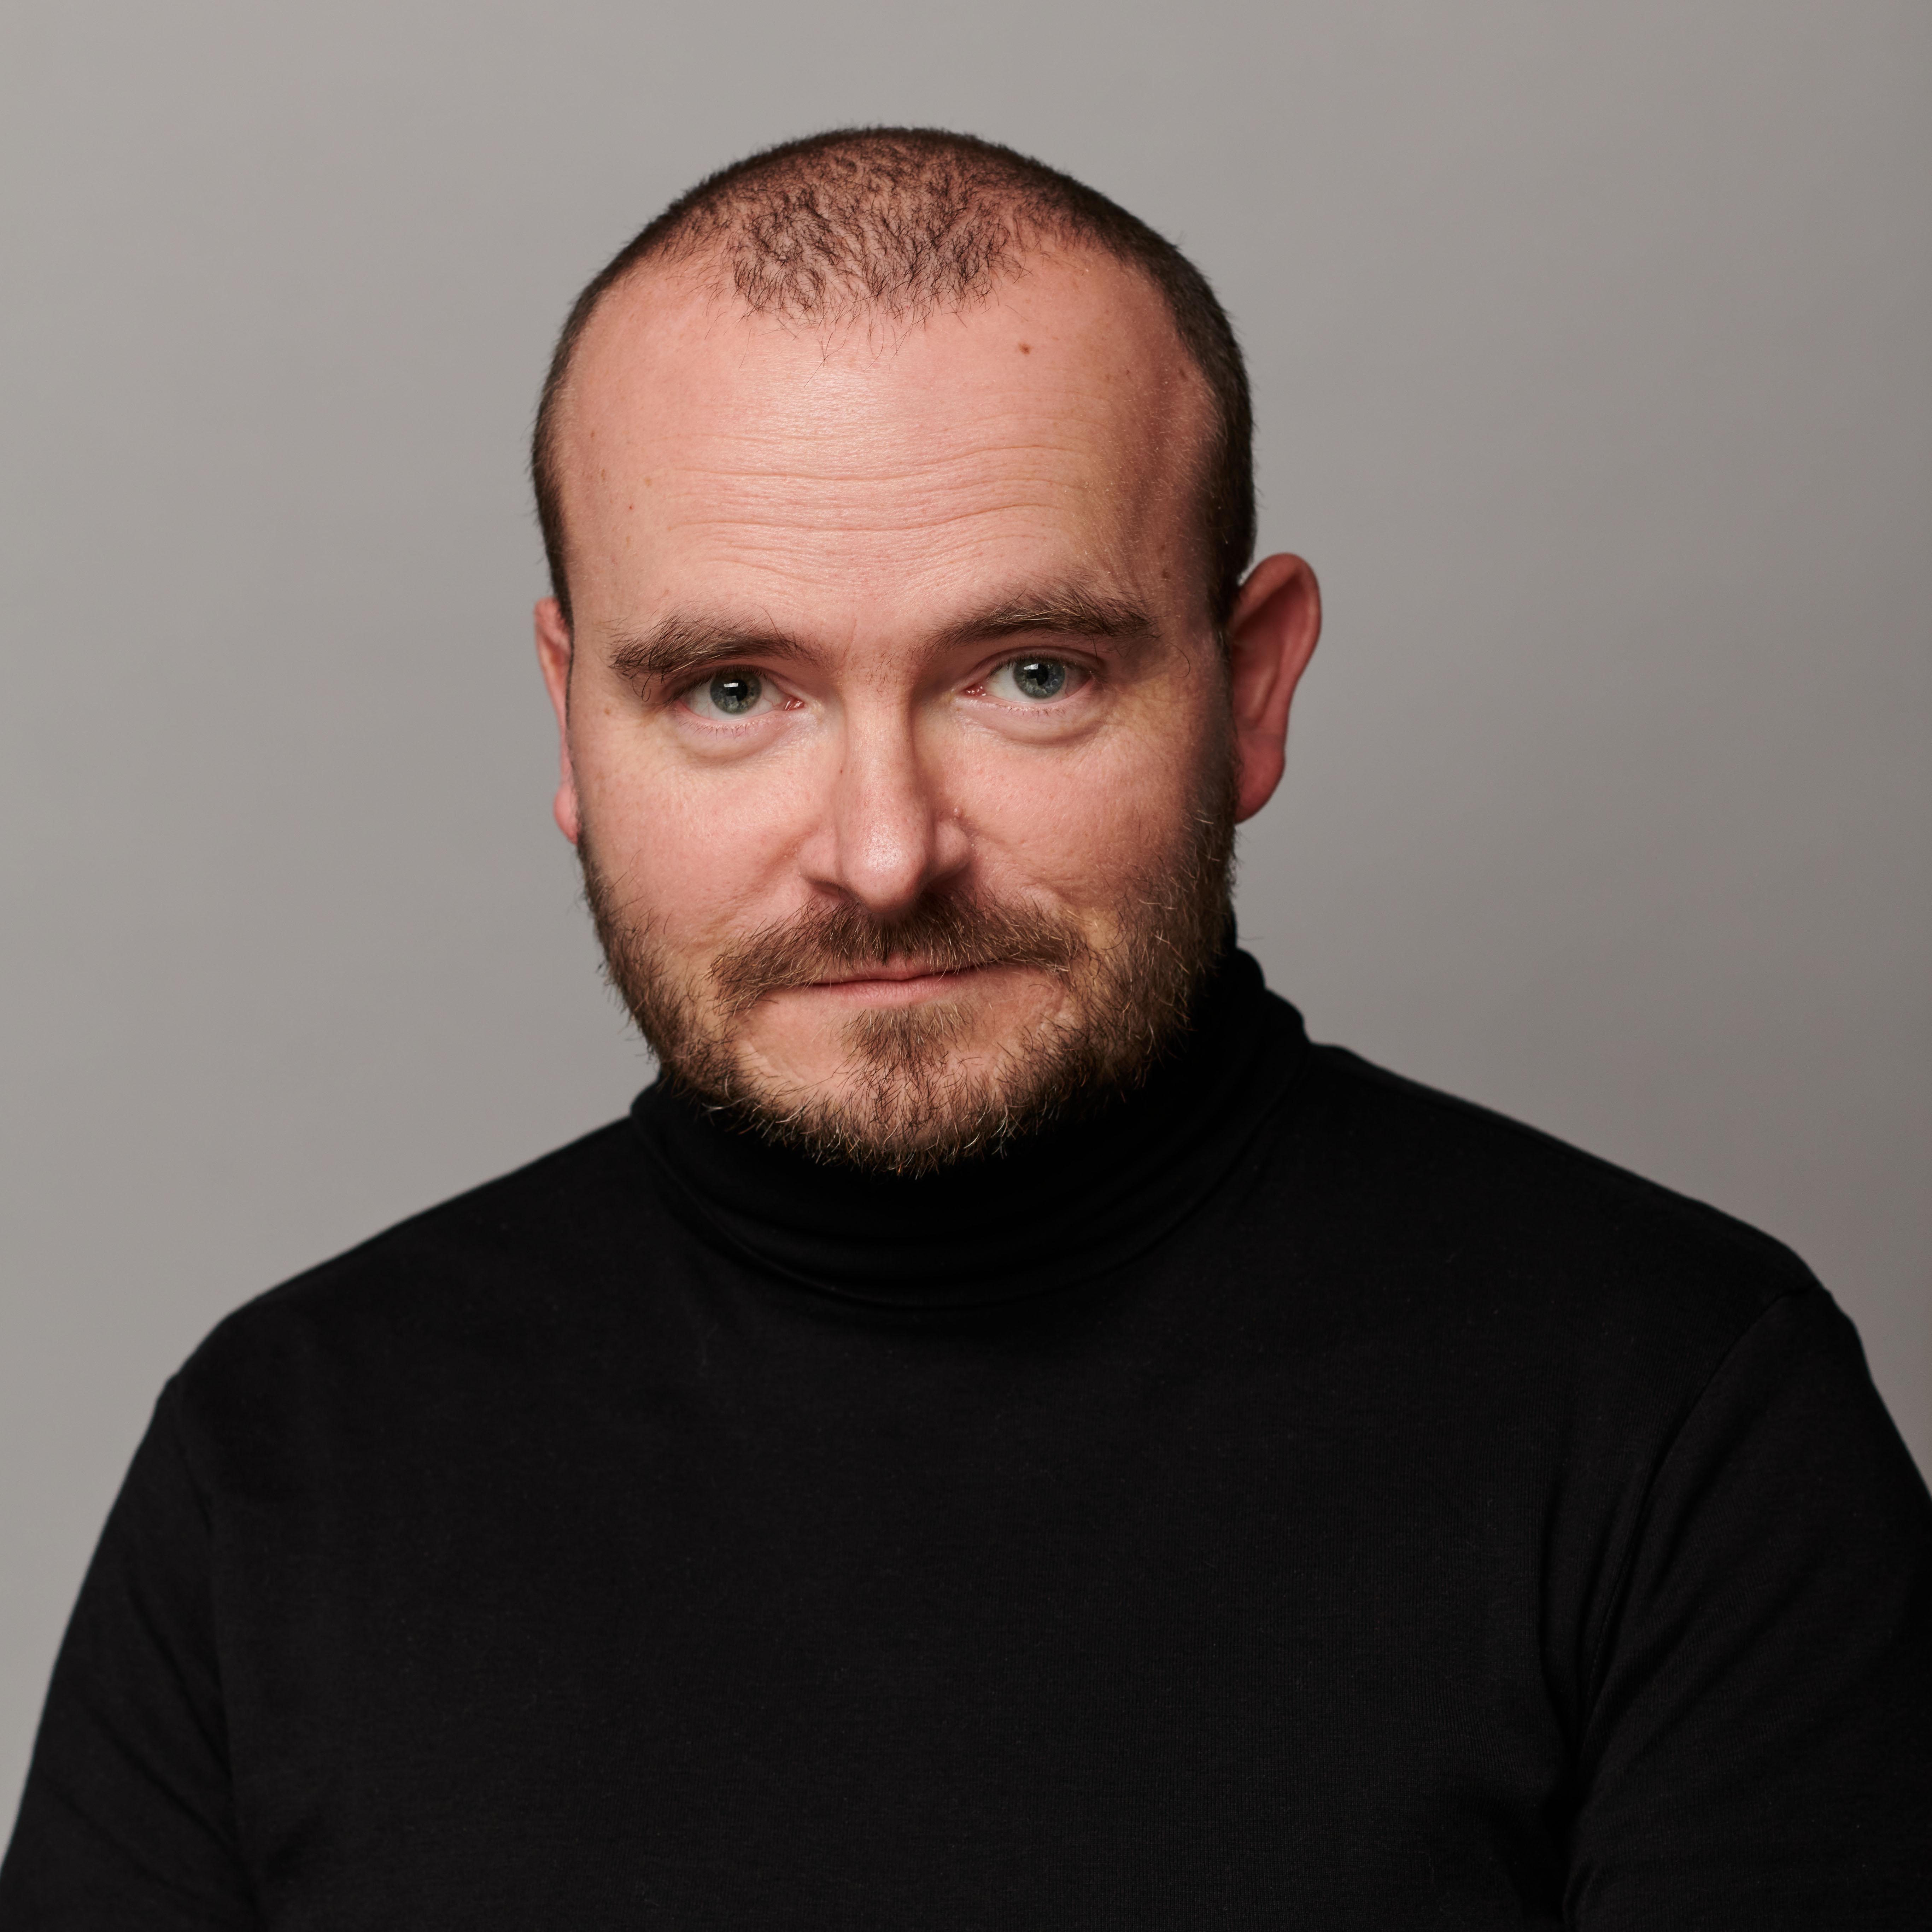 Michał Tomasz Wójciuk